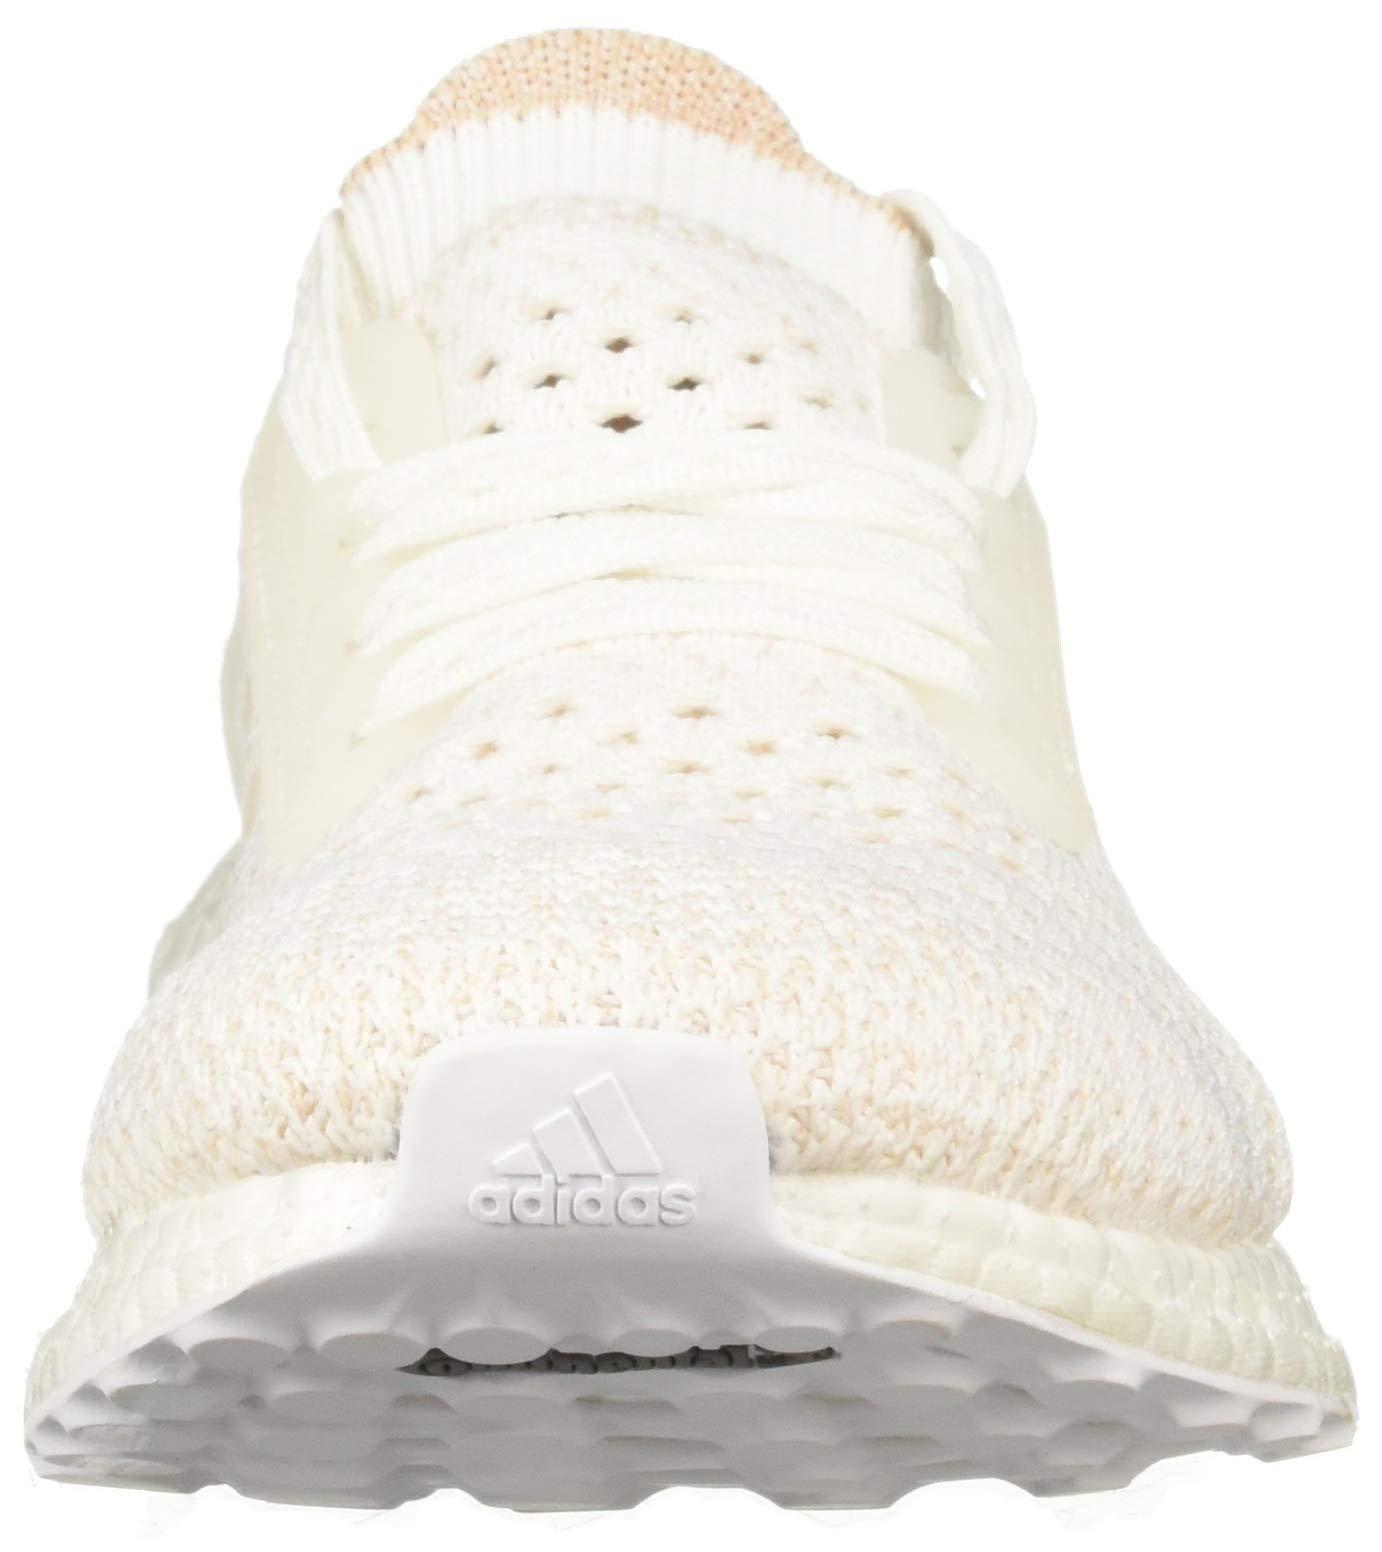 613OHruin5L - adidas Ultraboost X Clima, Women's Ultraboost X Clima